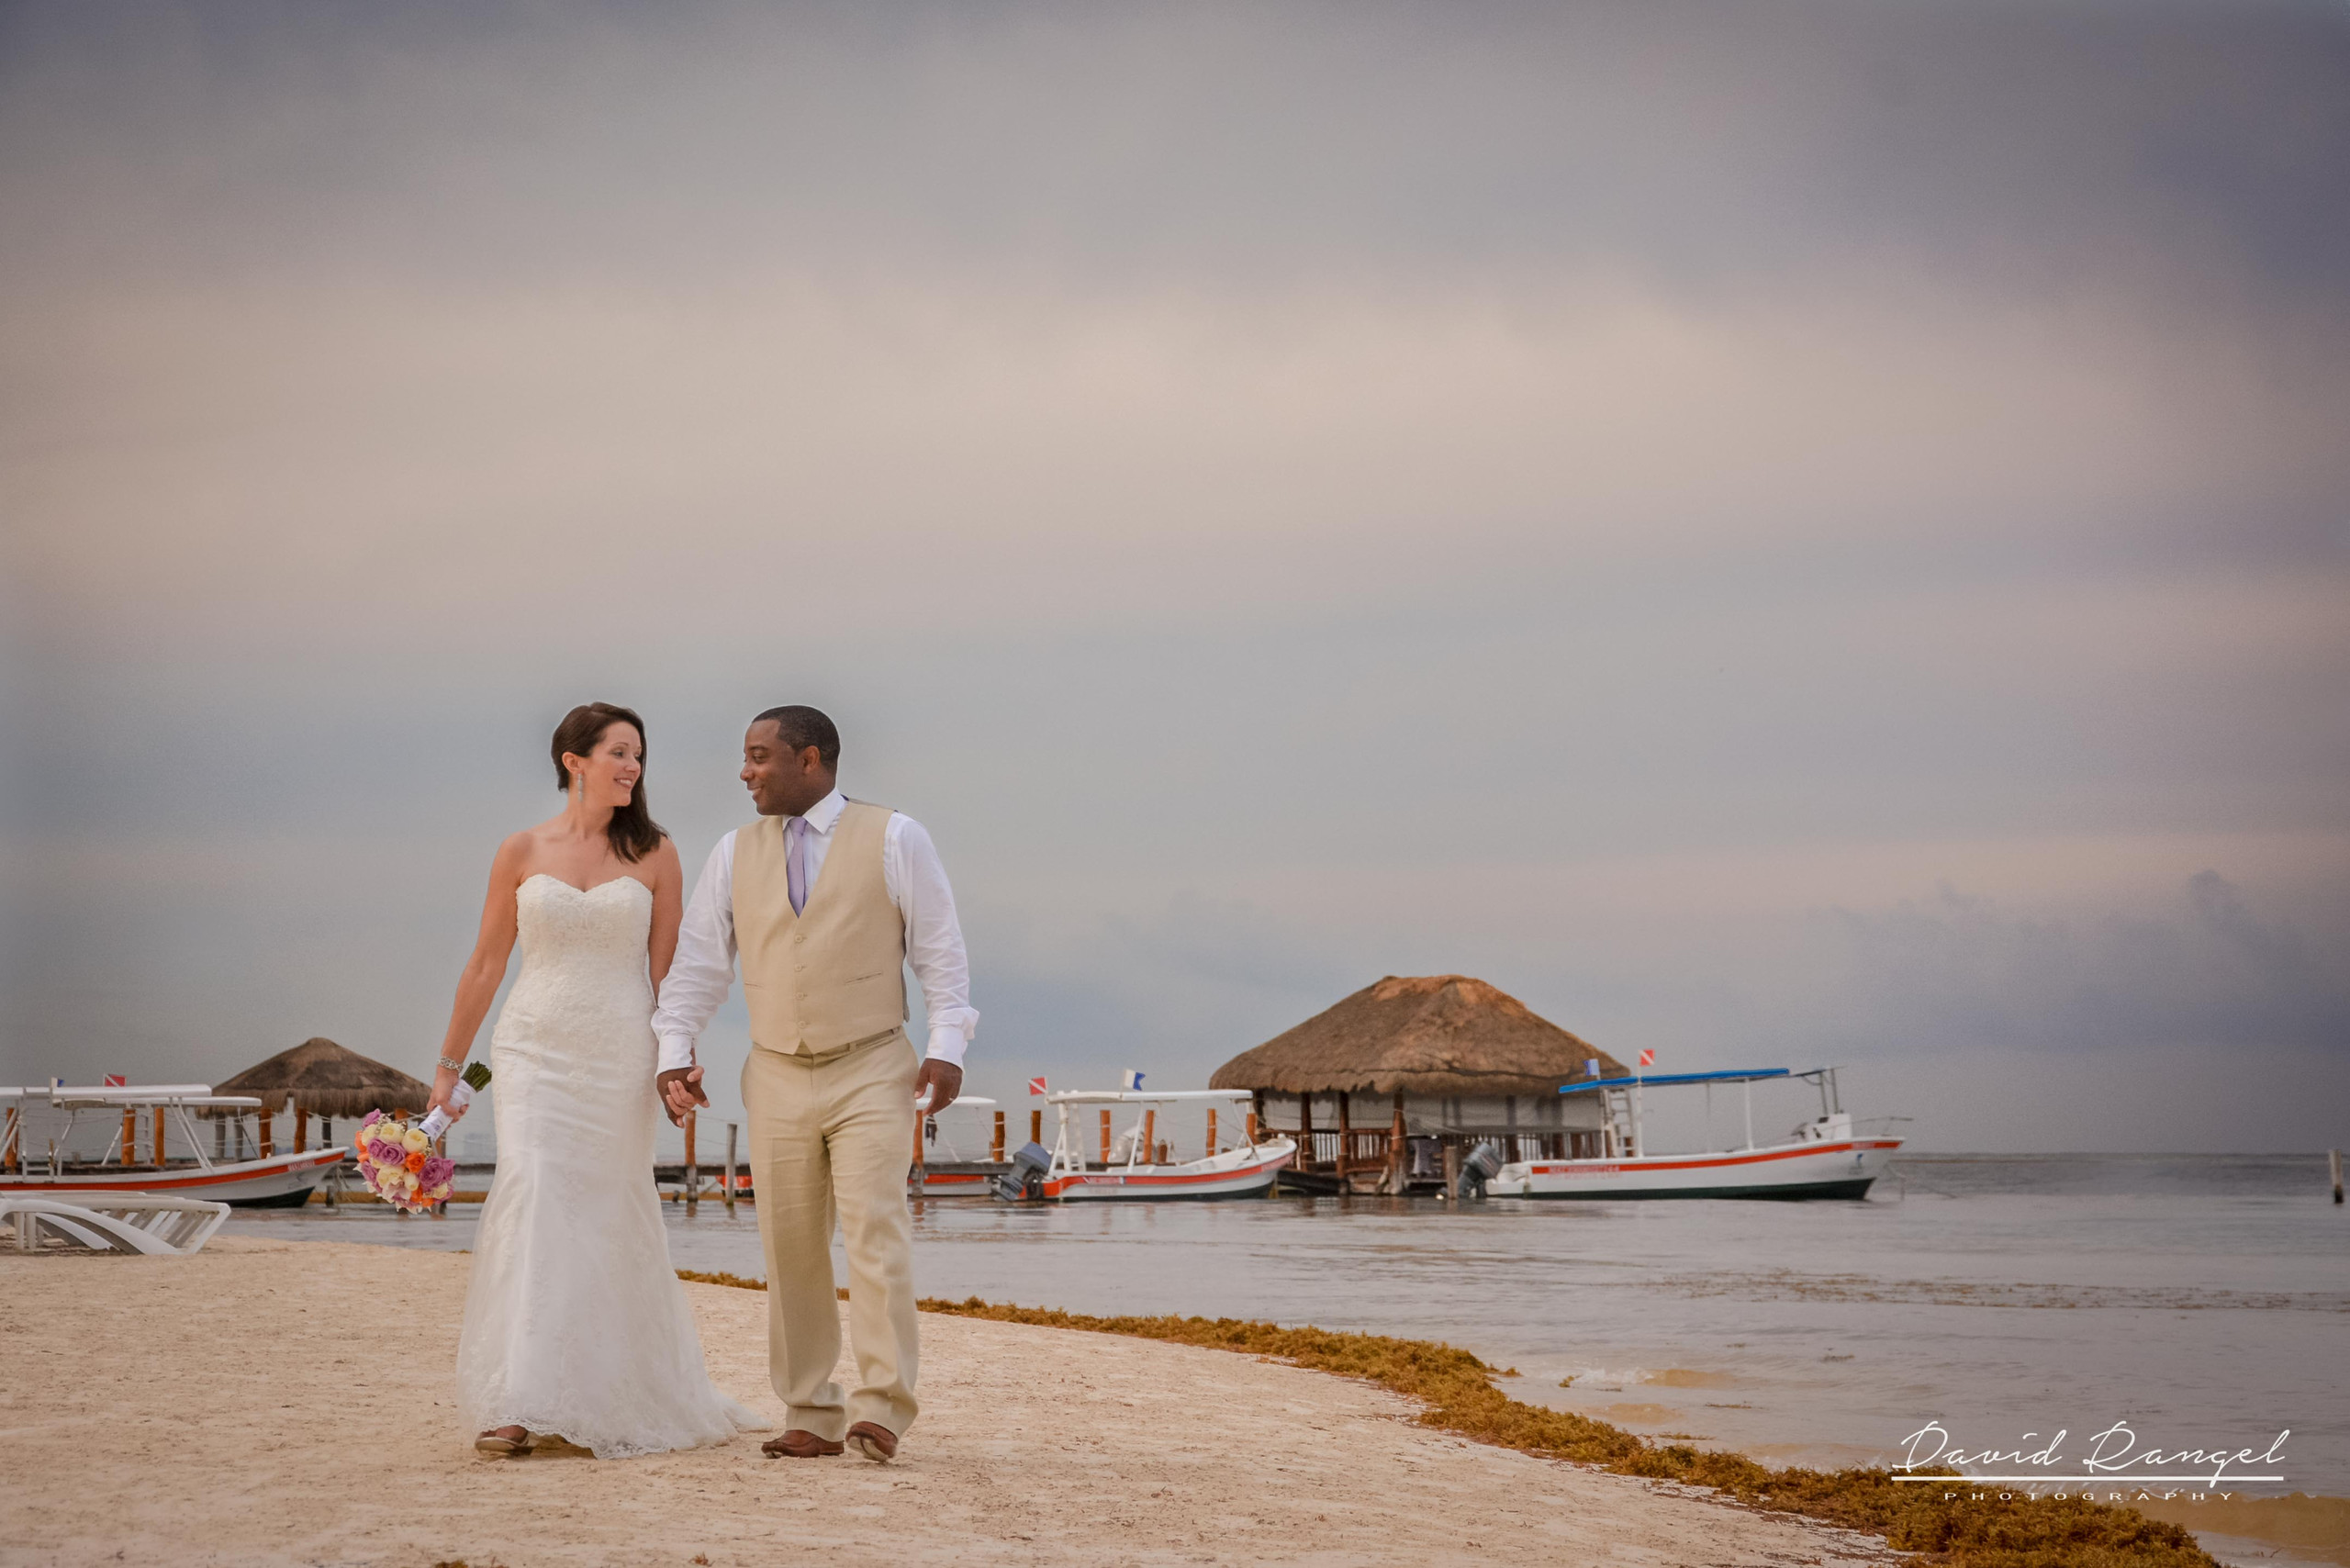 wedding shotting